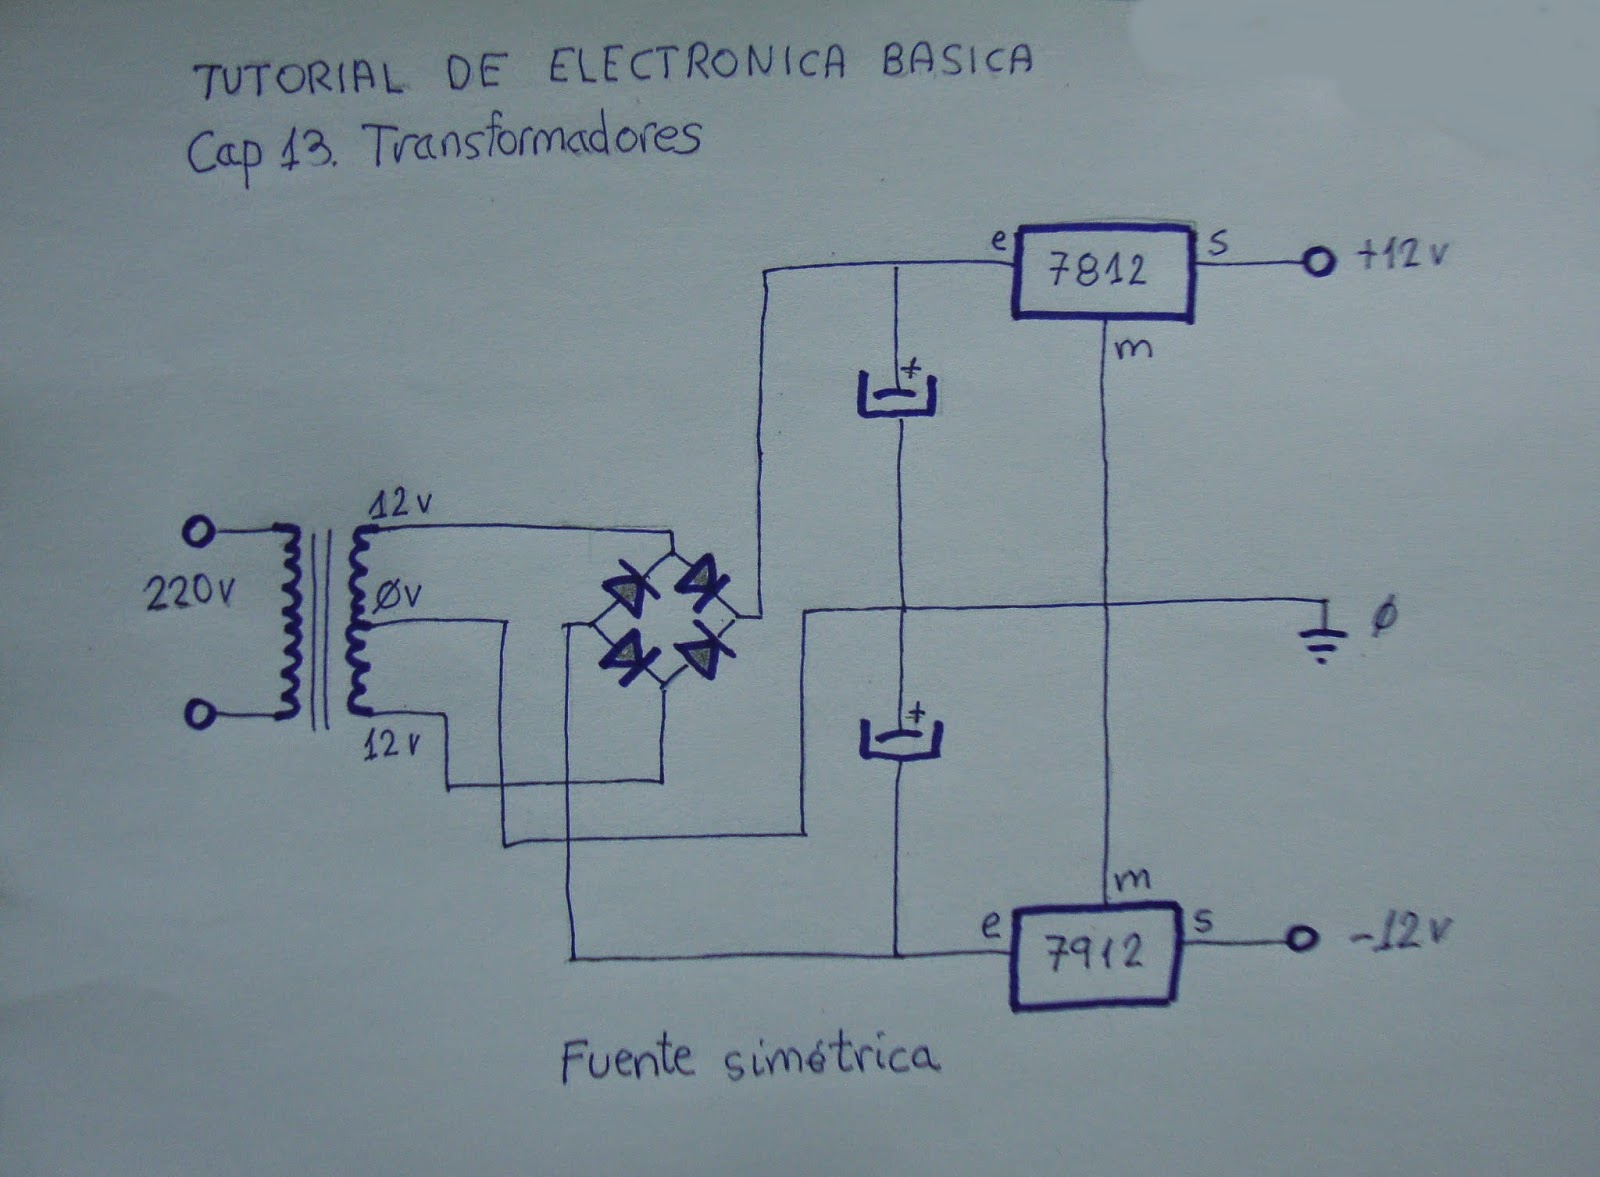 Electr nica b sica cap 13 transformadores vilavide for Transformadores de corriente 220v a 12v